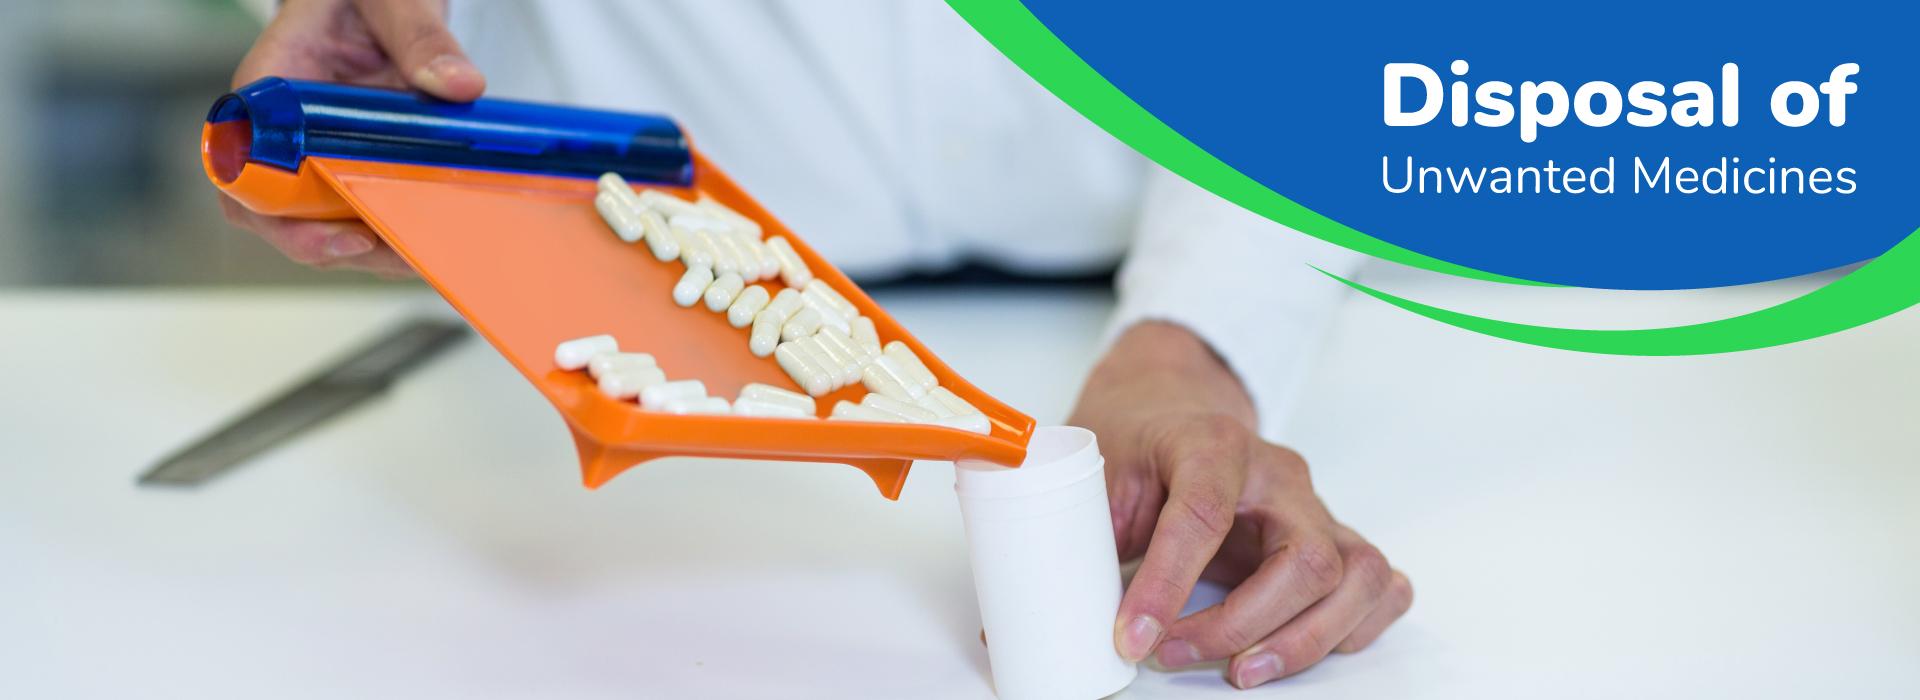 Disposal of unwanted medicines